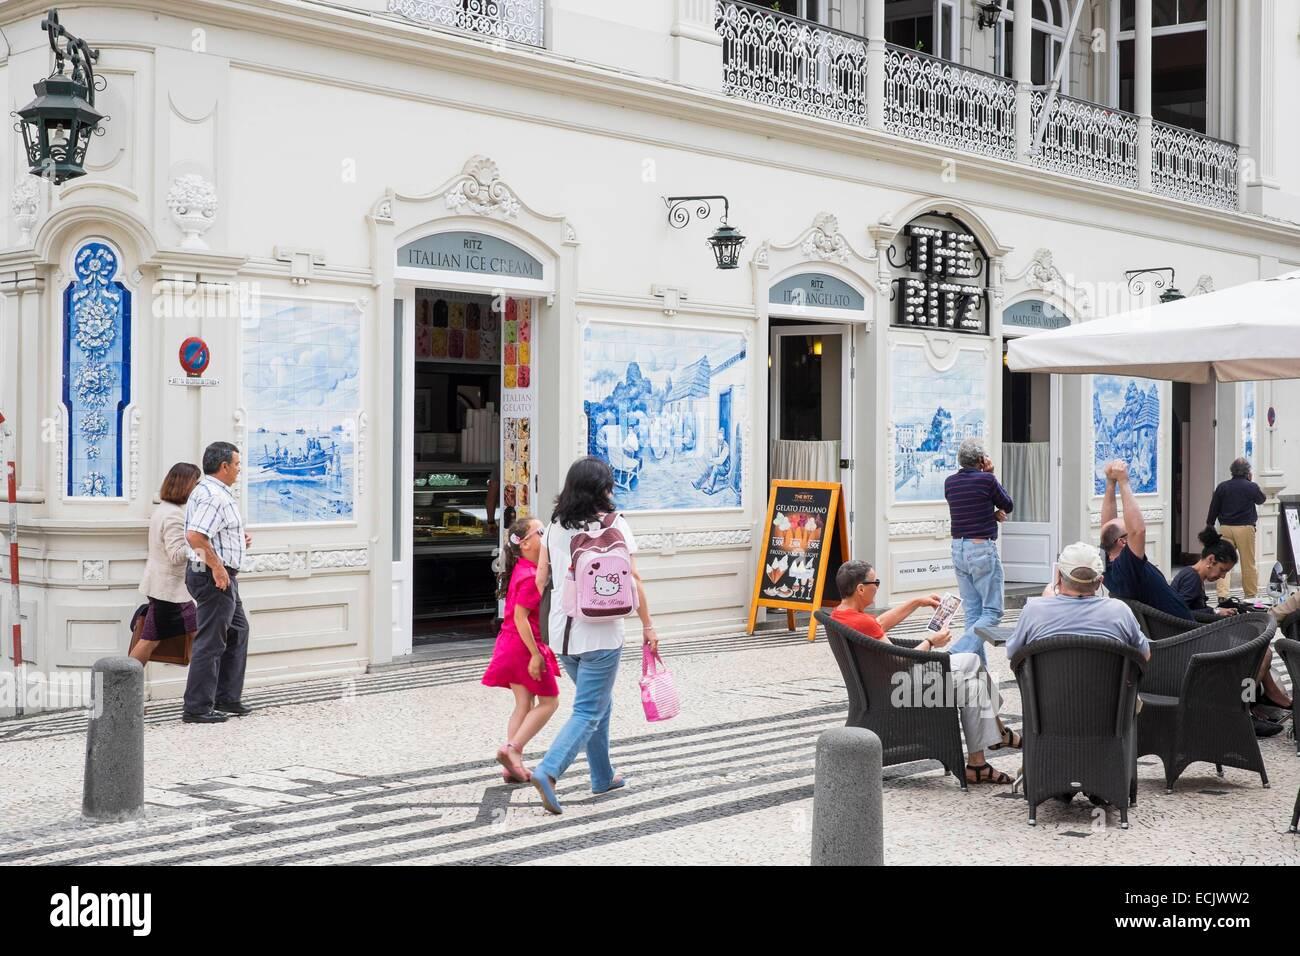 Portugal, Madeira island, Funchal, Ritz Cafe on Avenida Arriaga - Stock Image